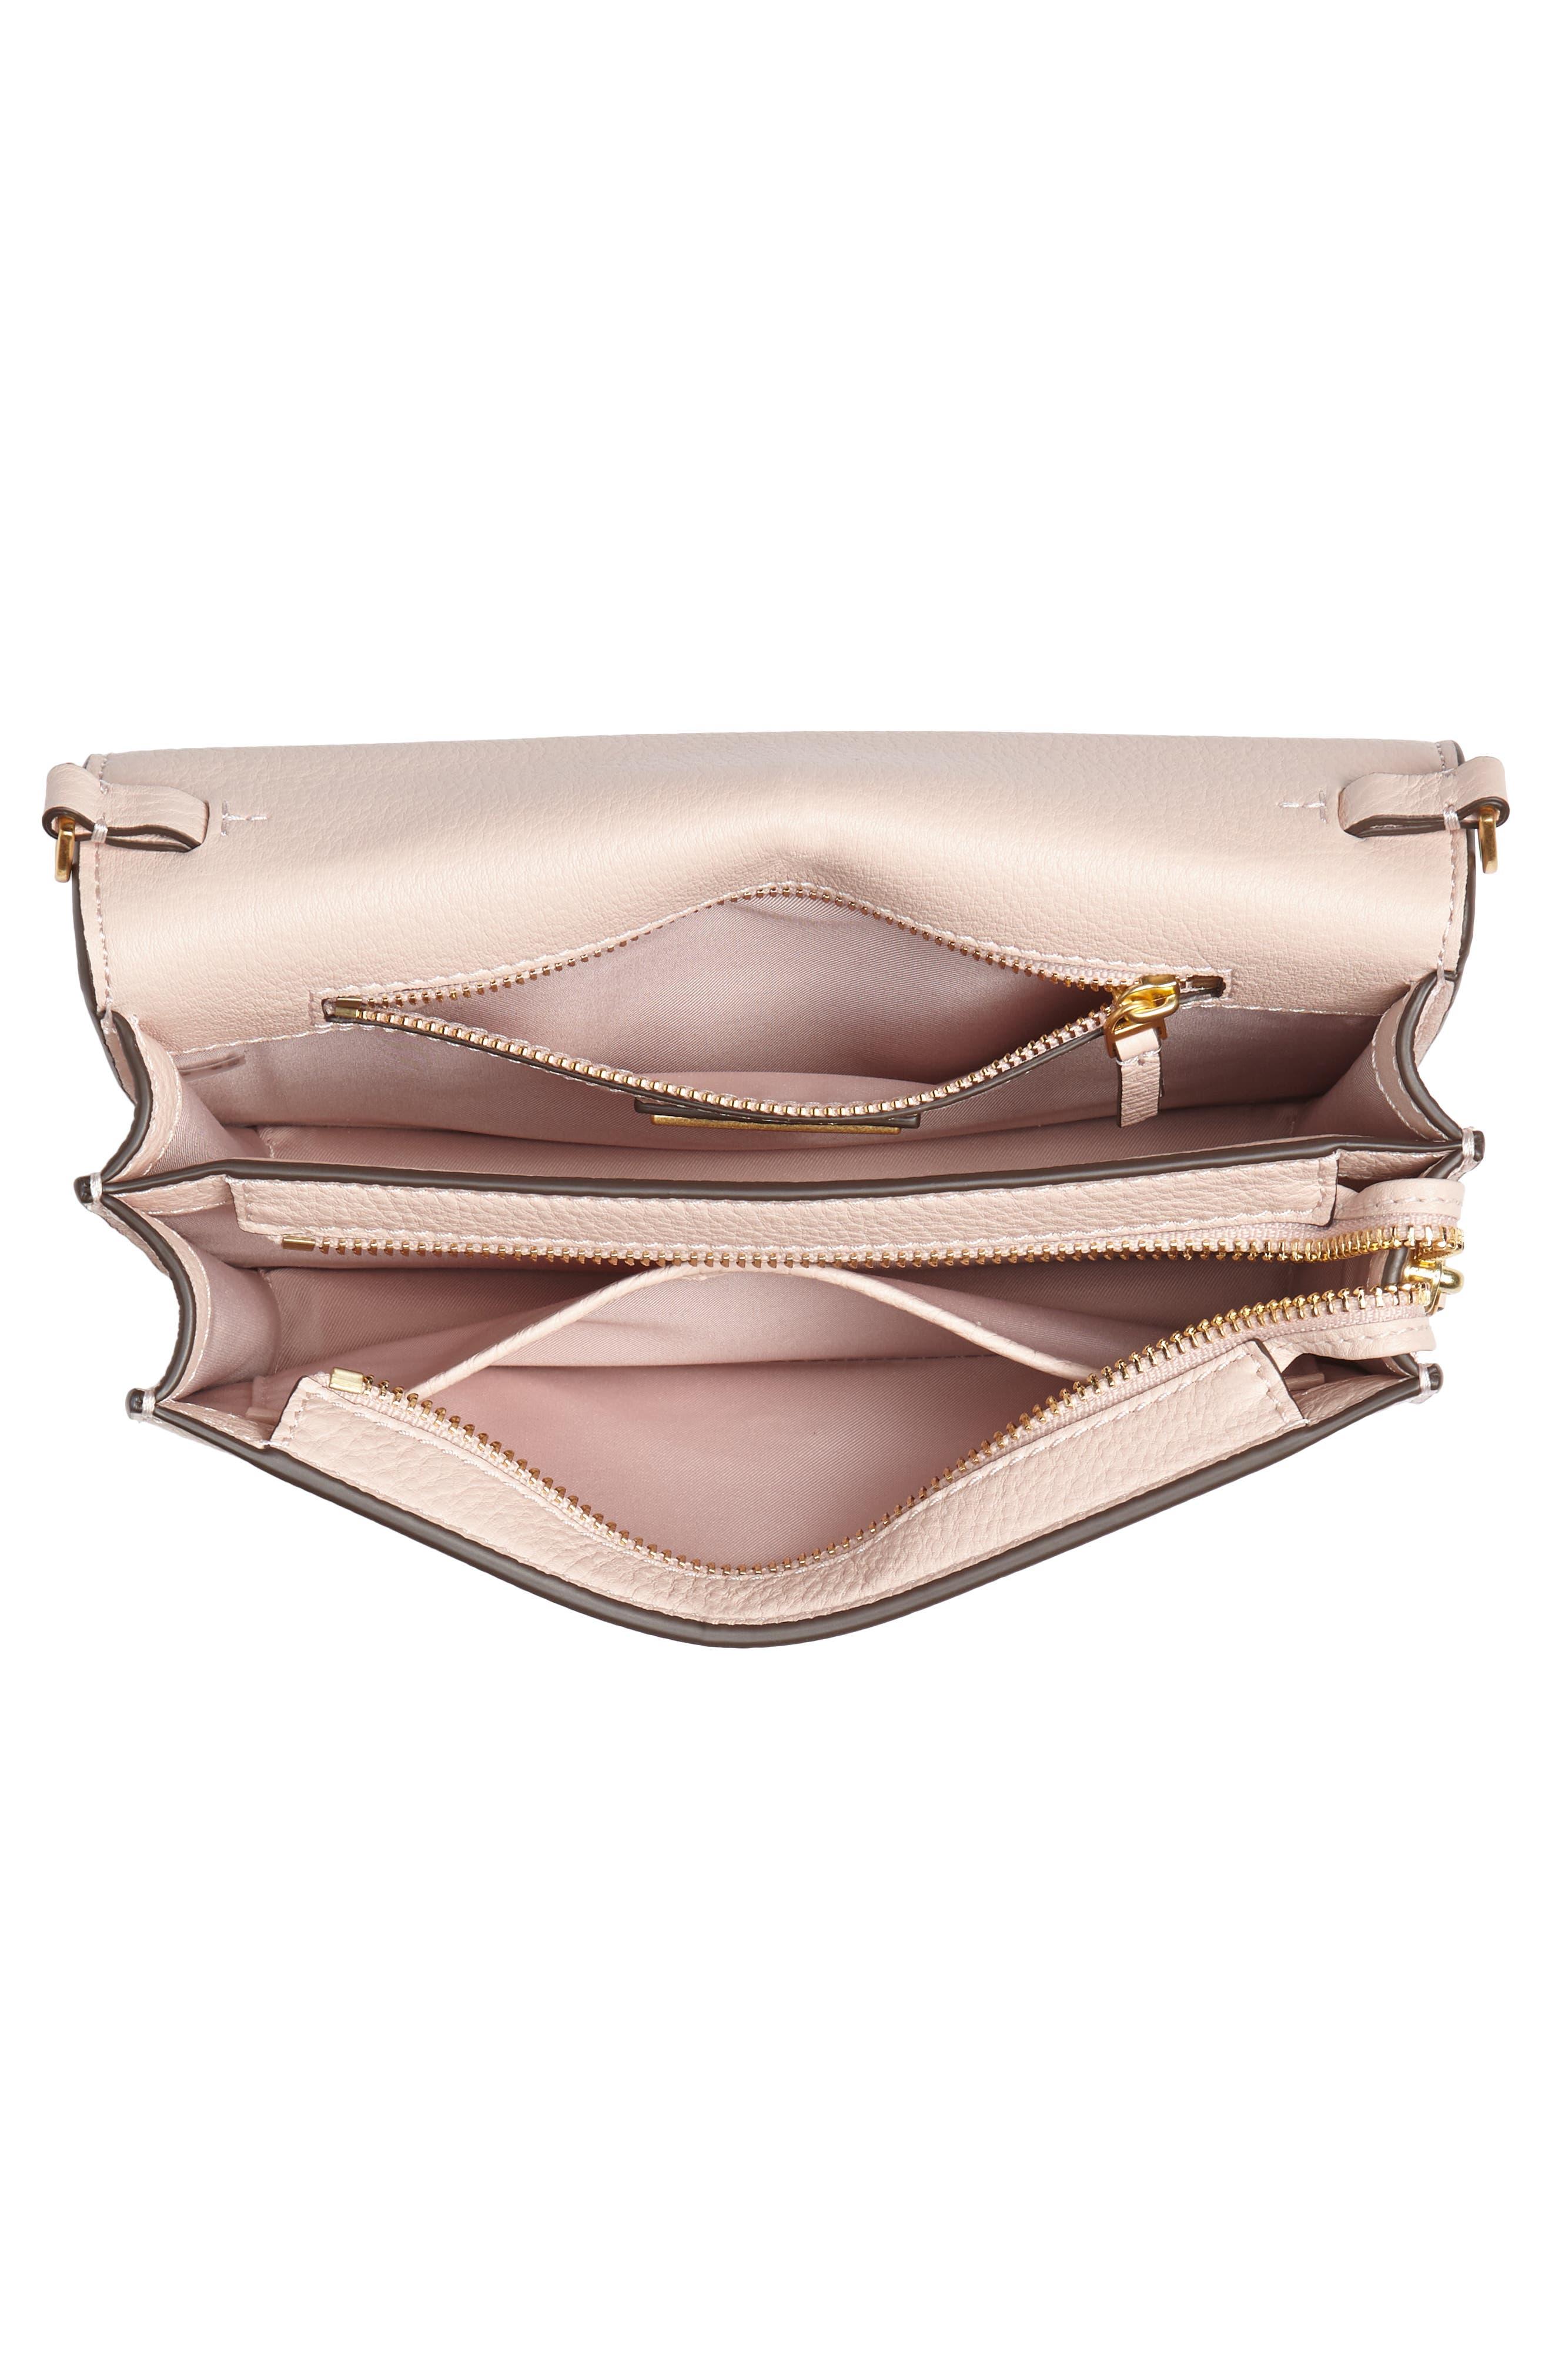 Georgia Pebble Leather Shoulder Bag,                             Alternate thumbnail 6, color,                             Shell Pink